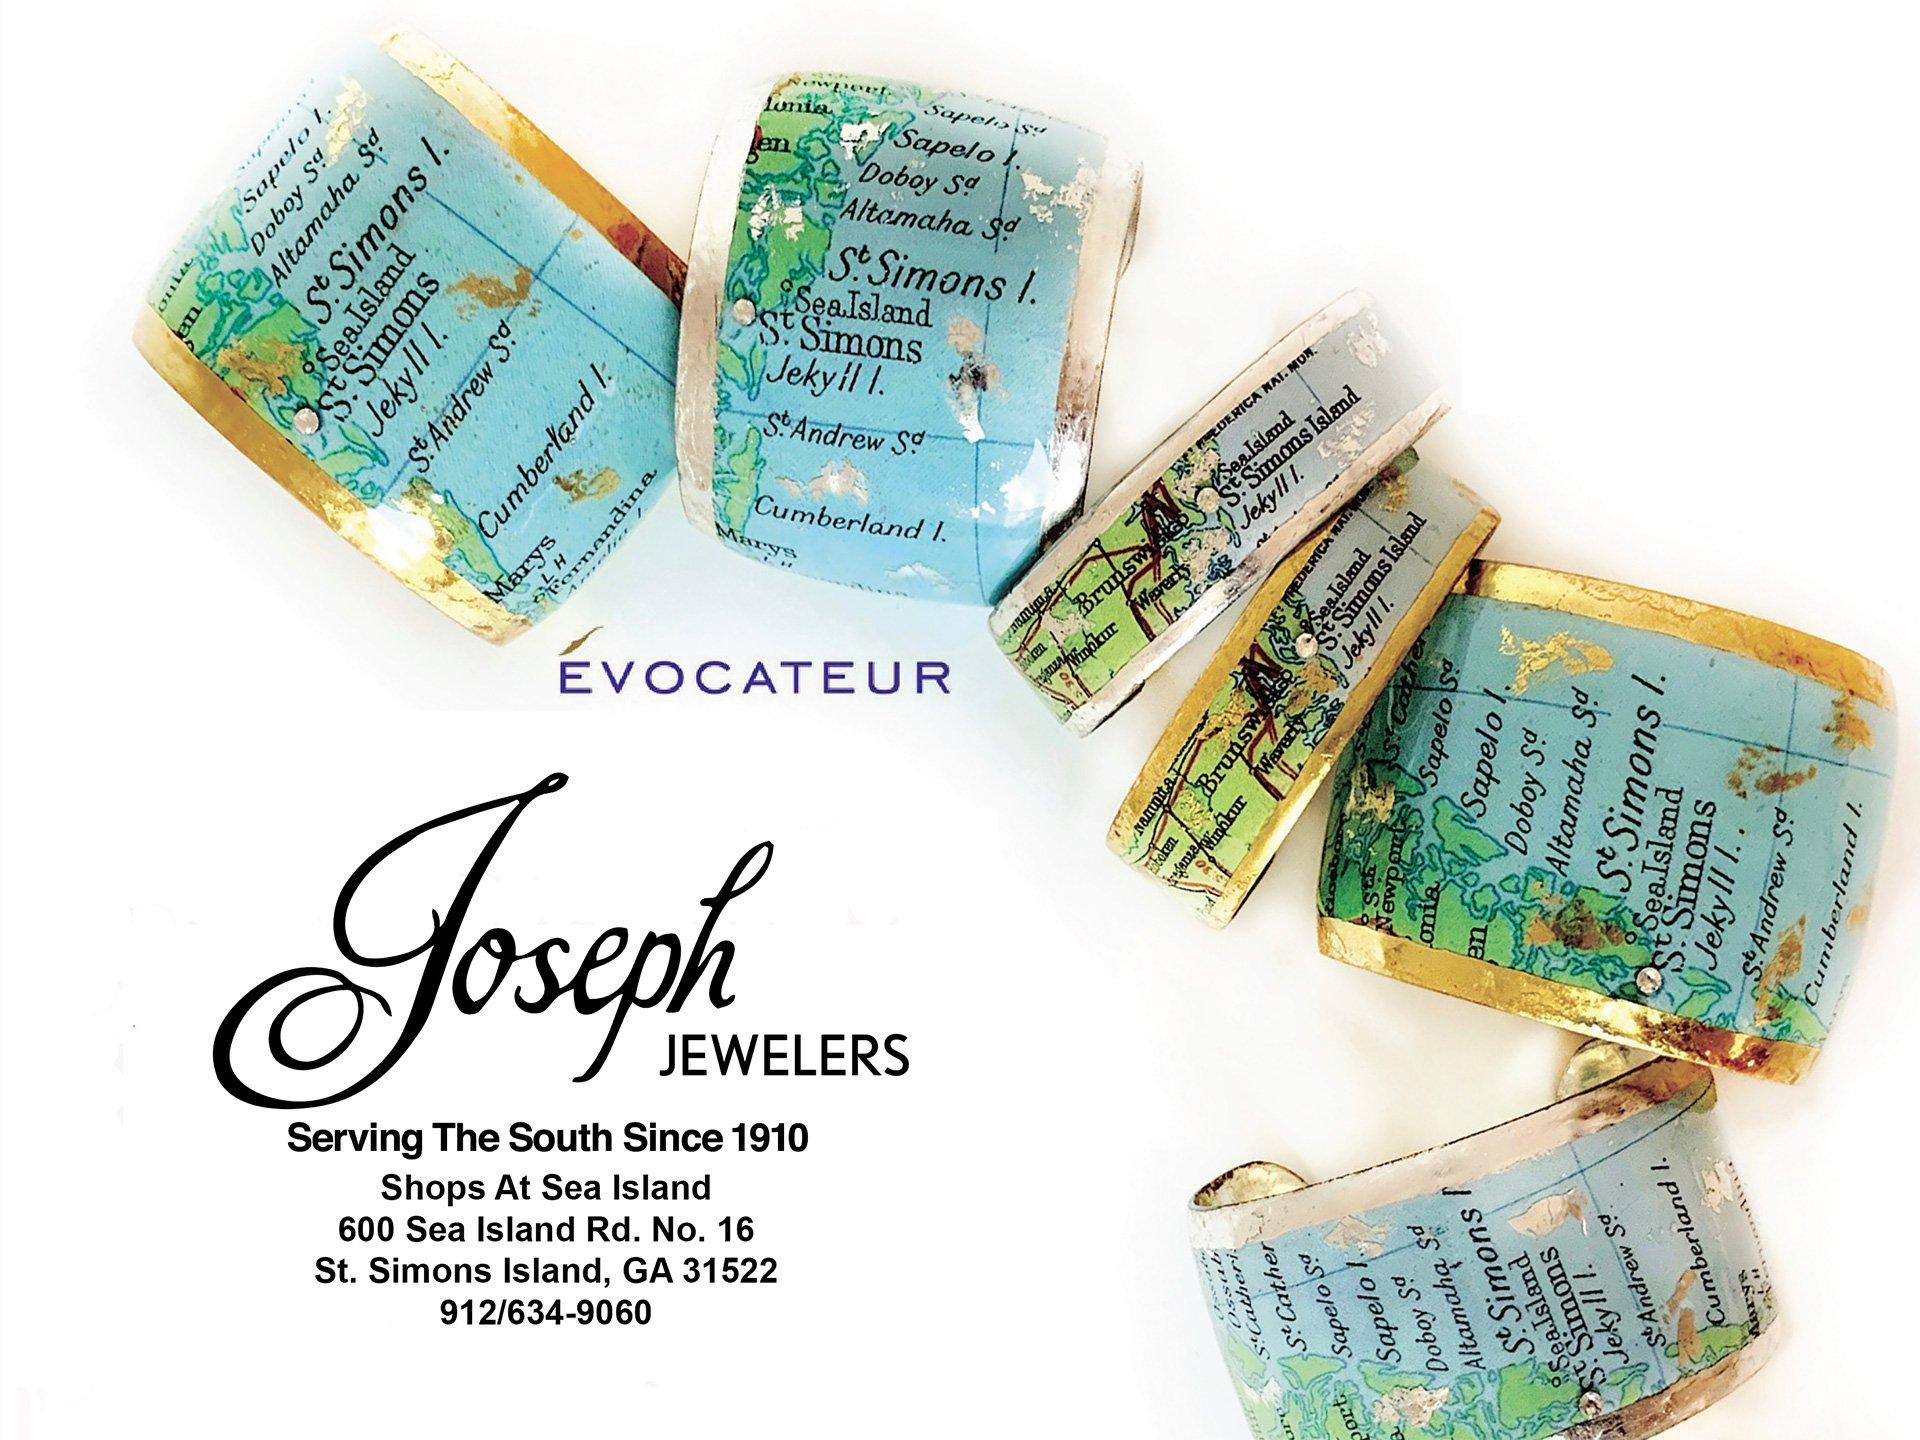 joseph-jewelers-cover